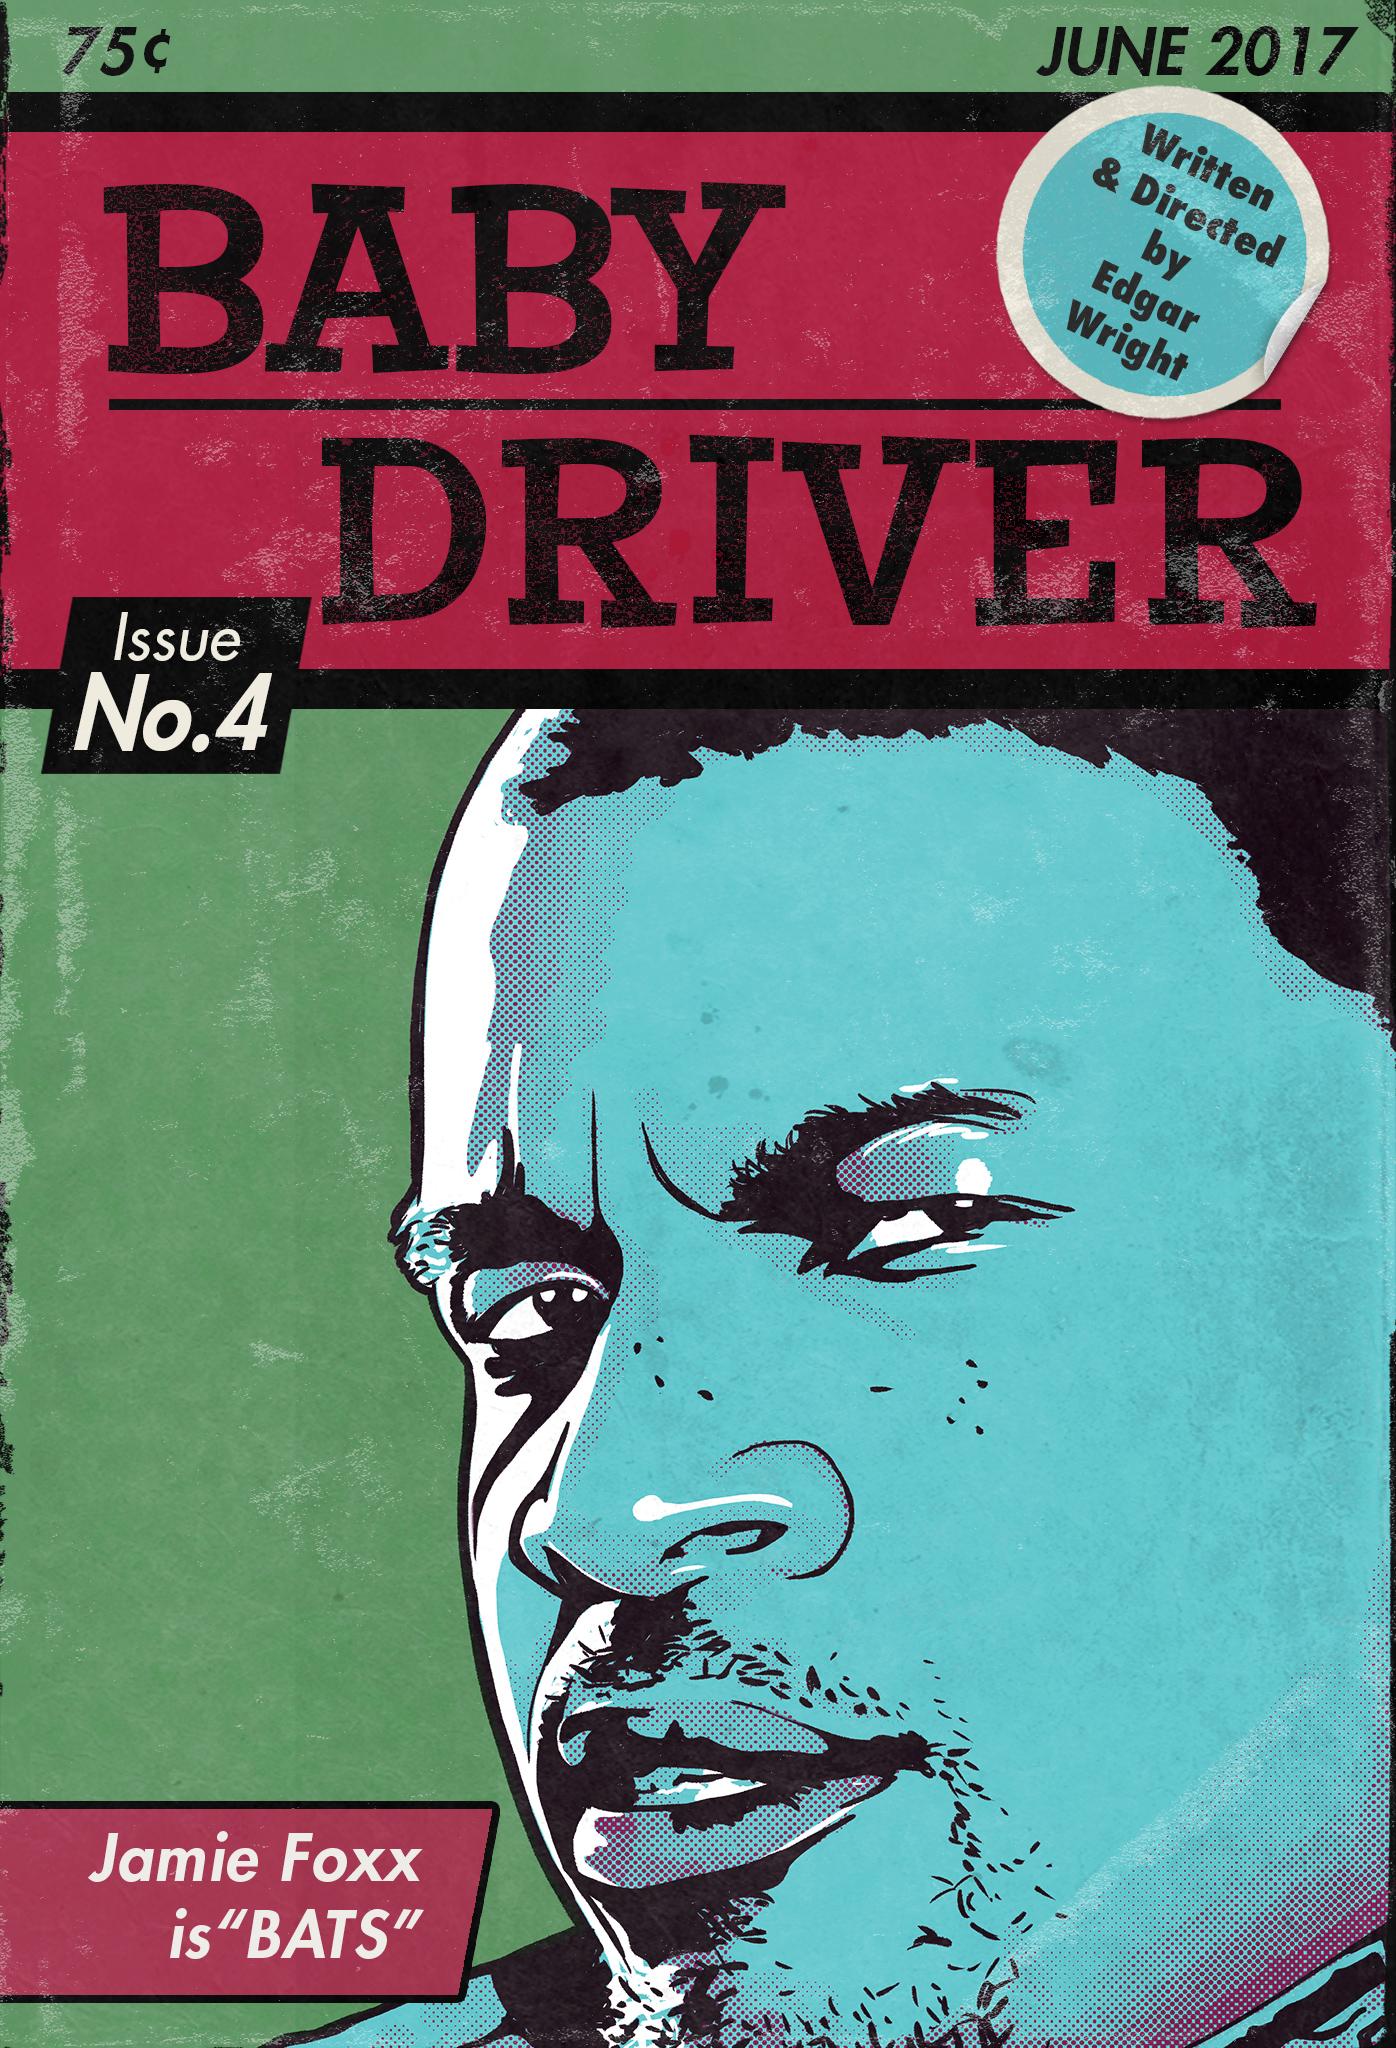 Baby Driver Poster No. 4 - Jamie Foxx